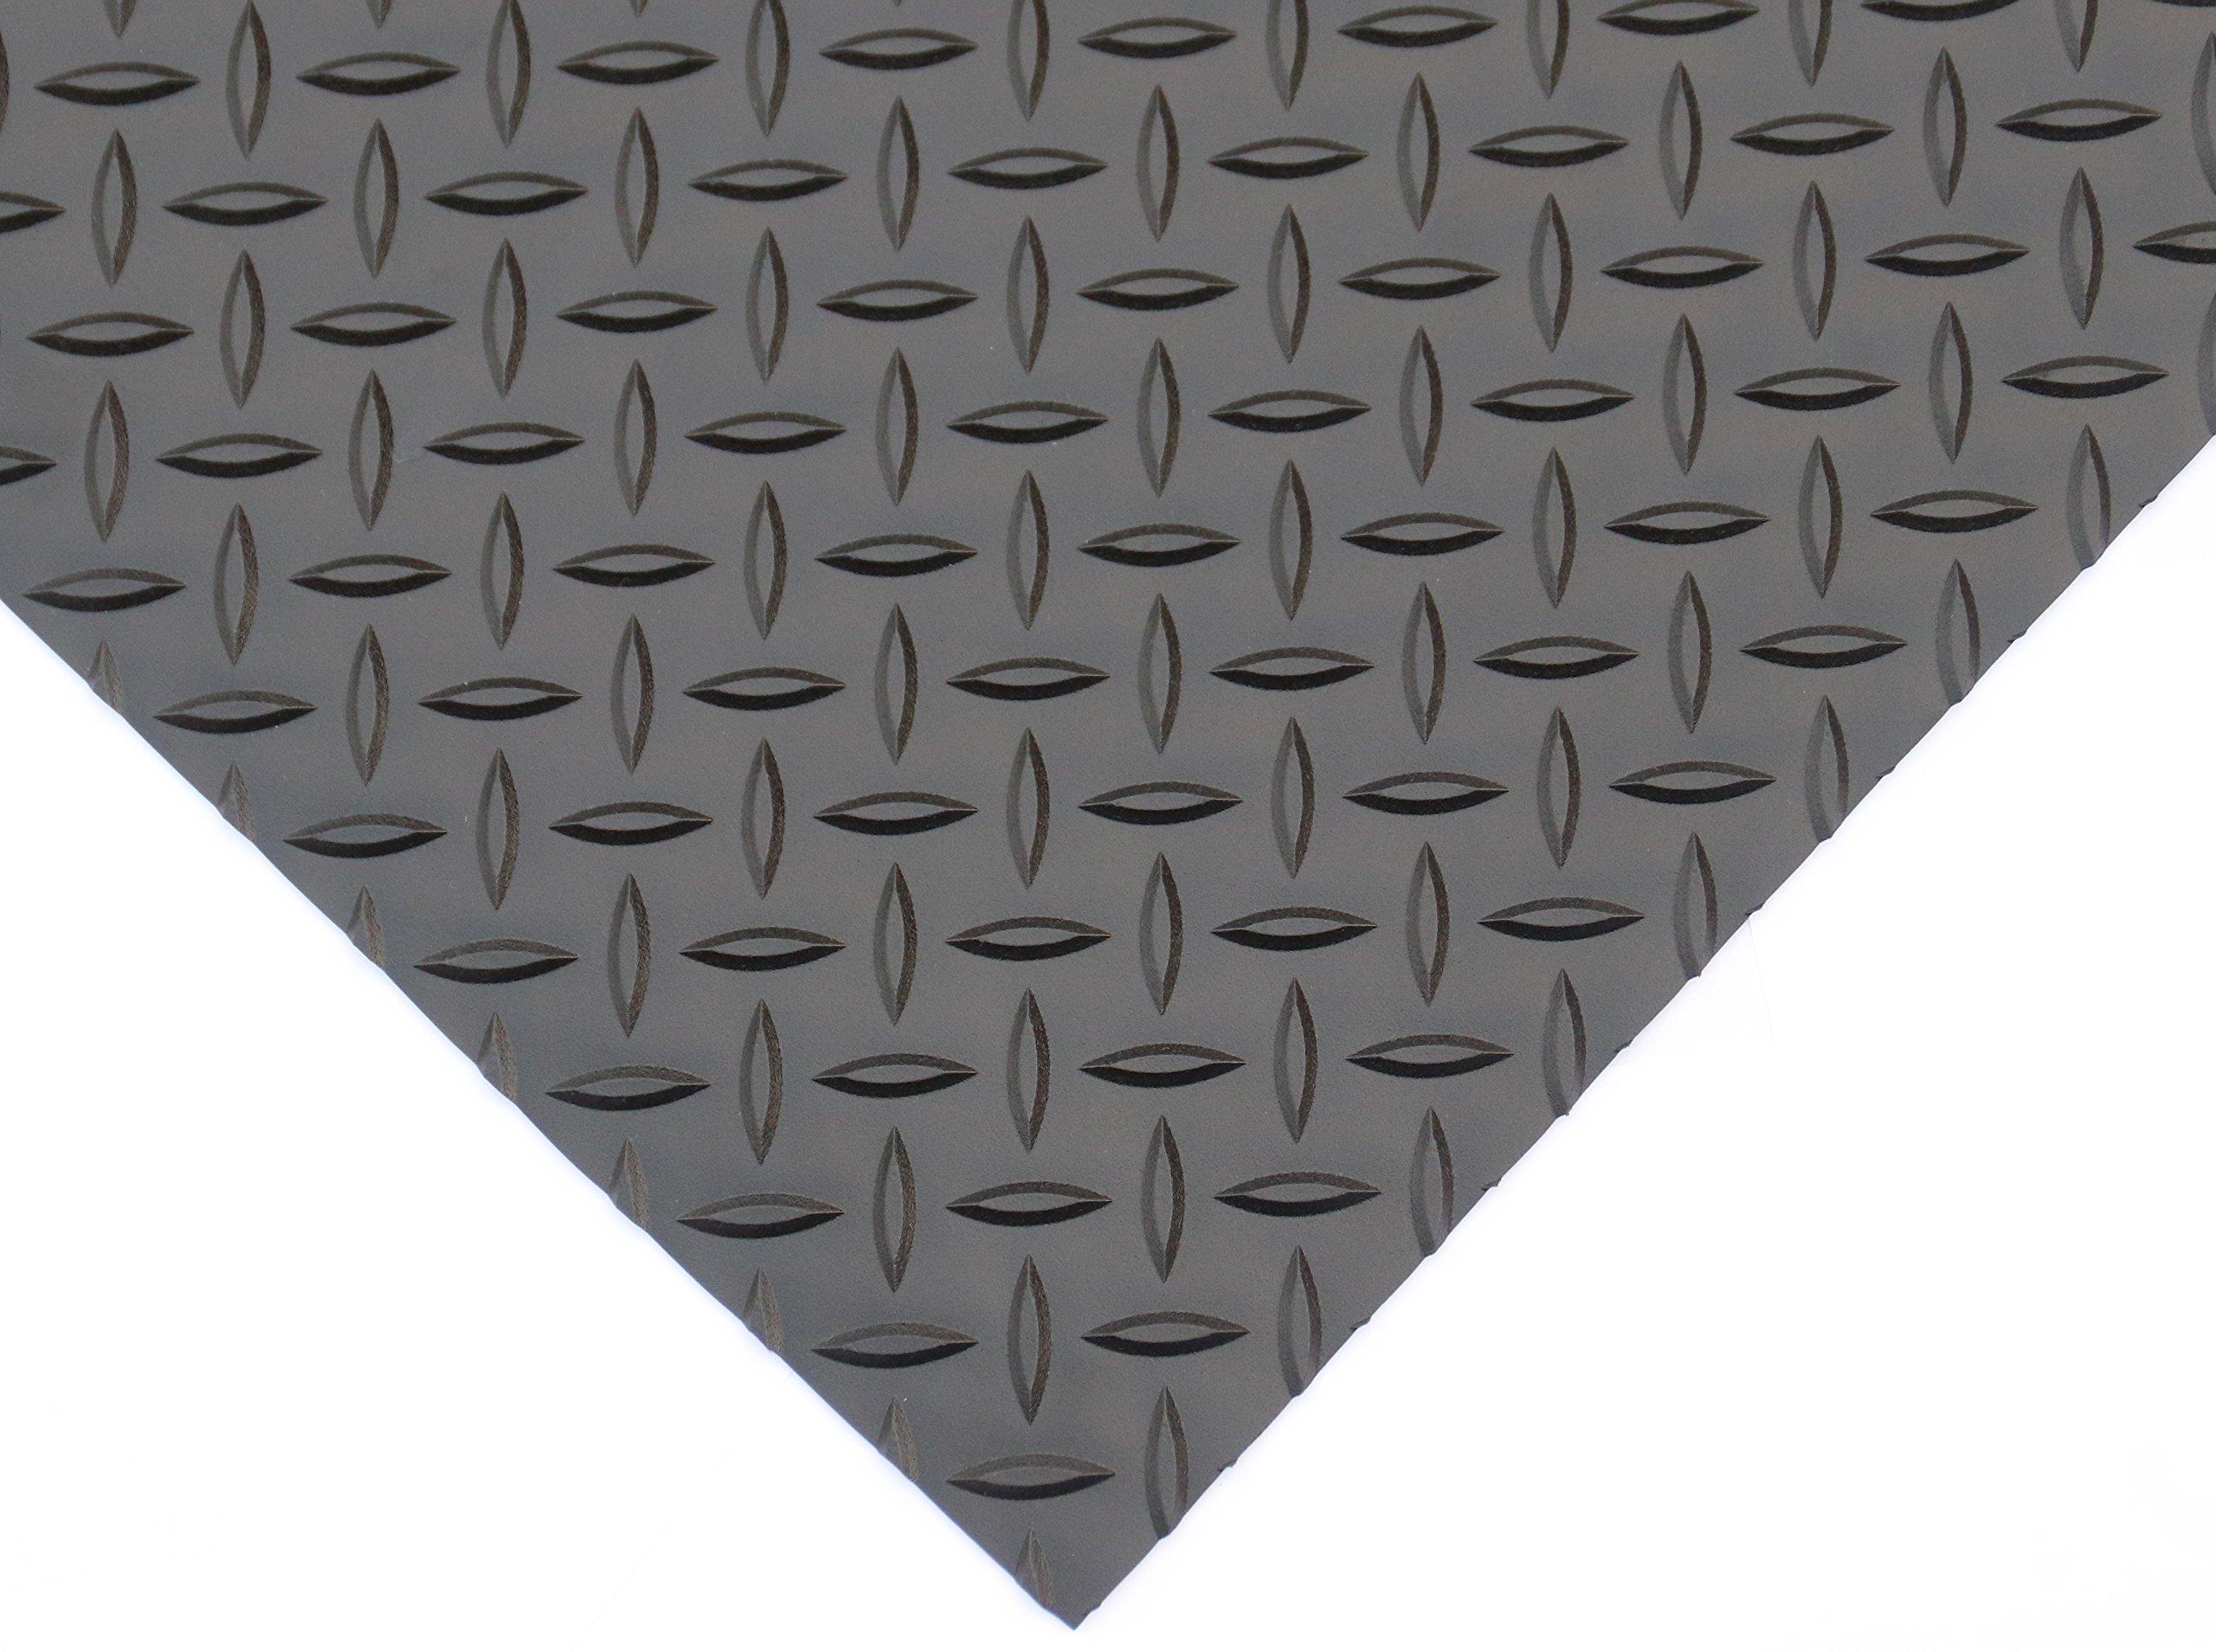 Rhino Mats DV48X3 Diamond Plate Rubber Flooring, Rubber, 1/8'' Thickness, Matt black by Rhino Mats